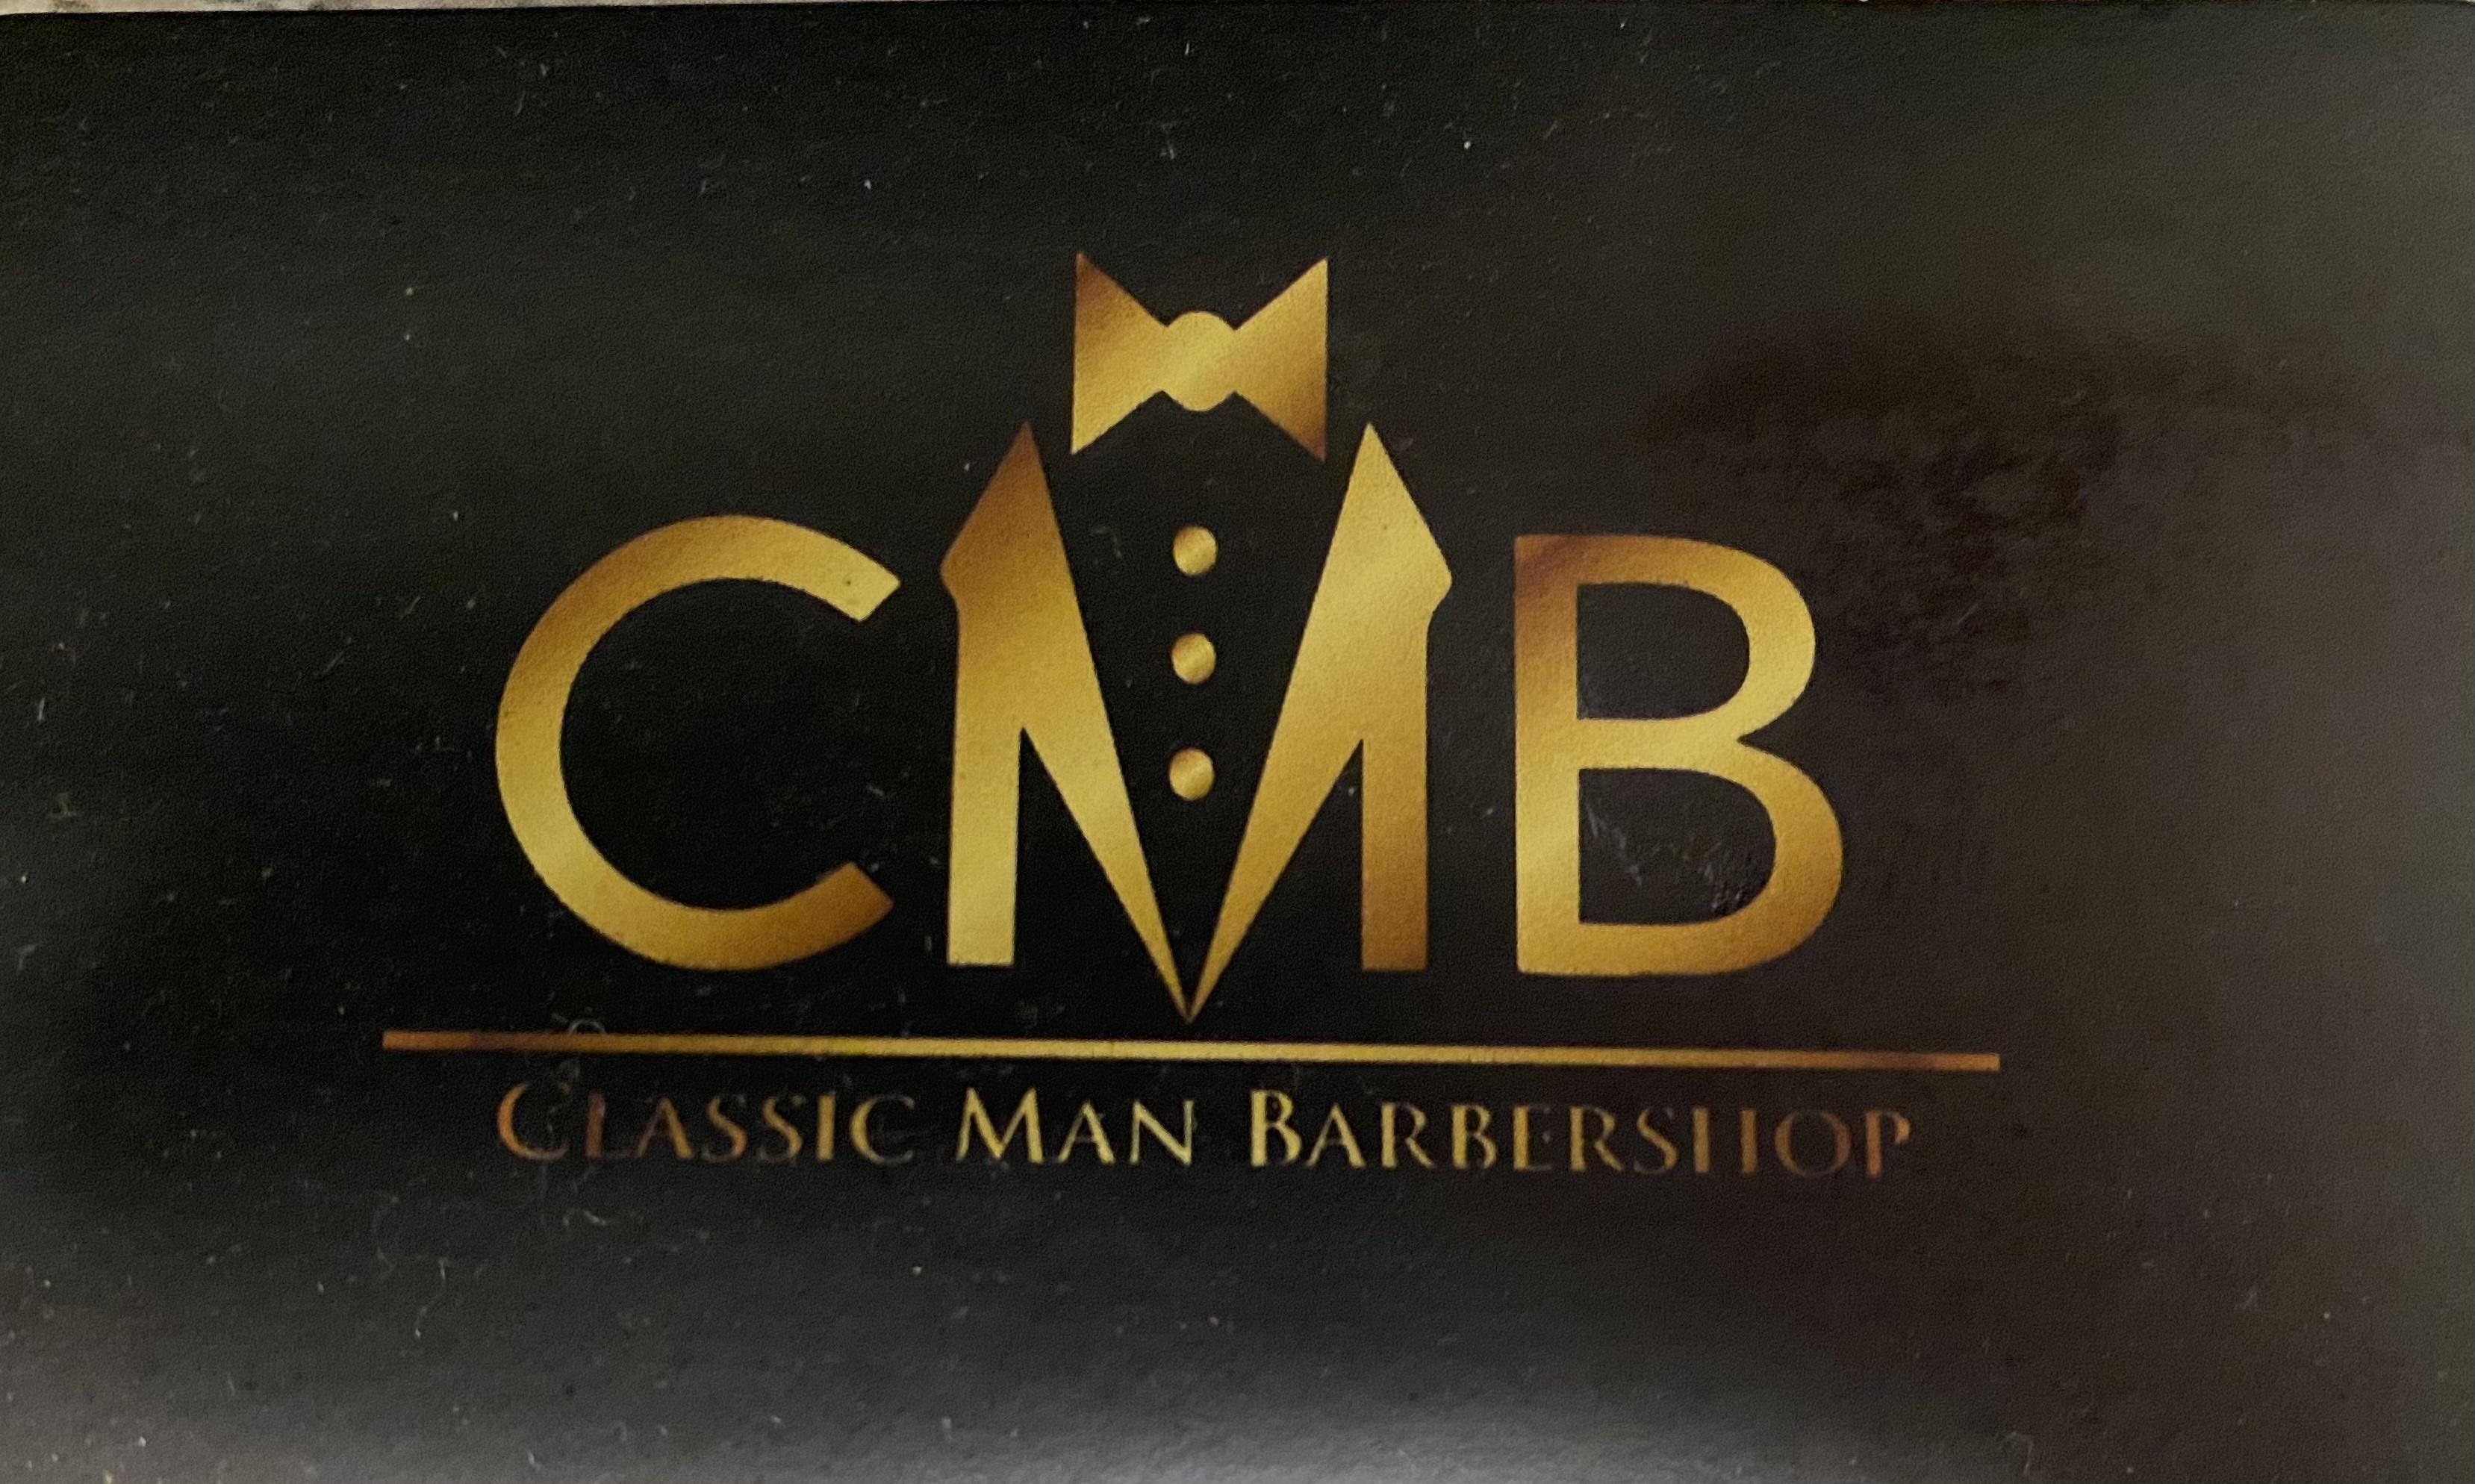 Classic Man Barbershop company logo